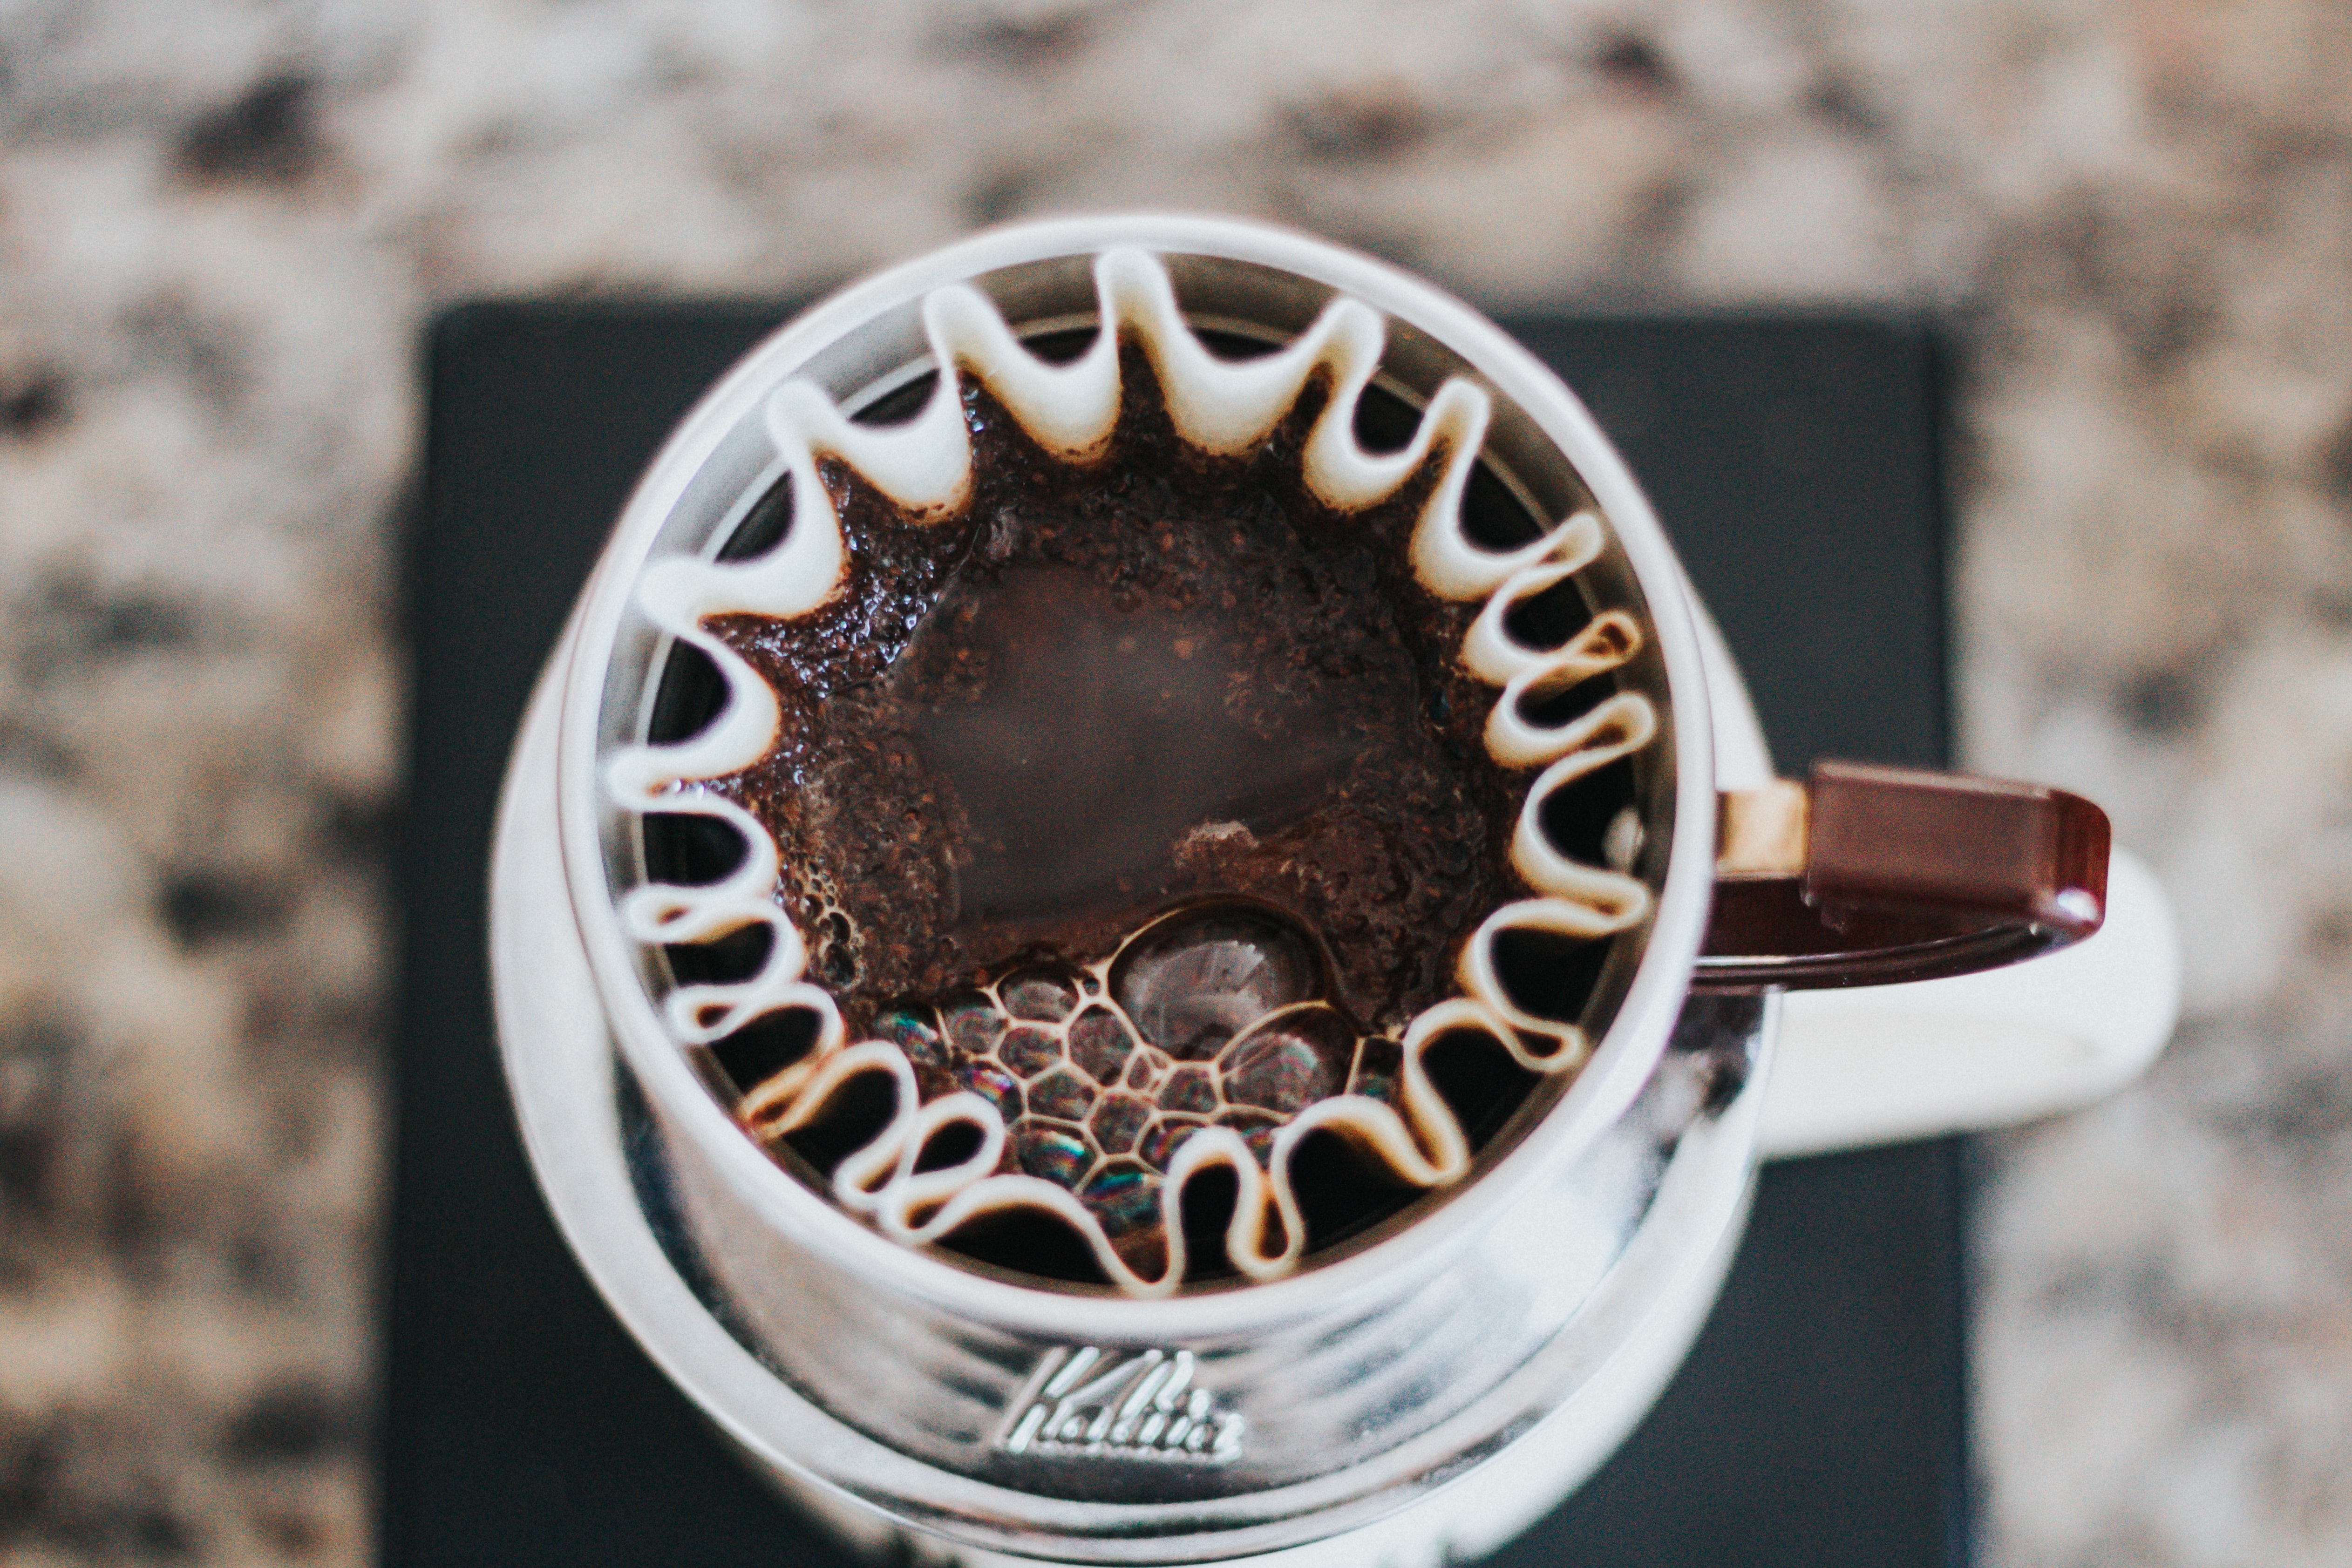 white and brown mug with coffee